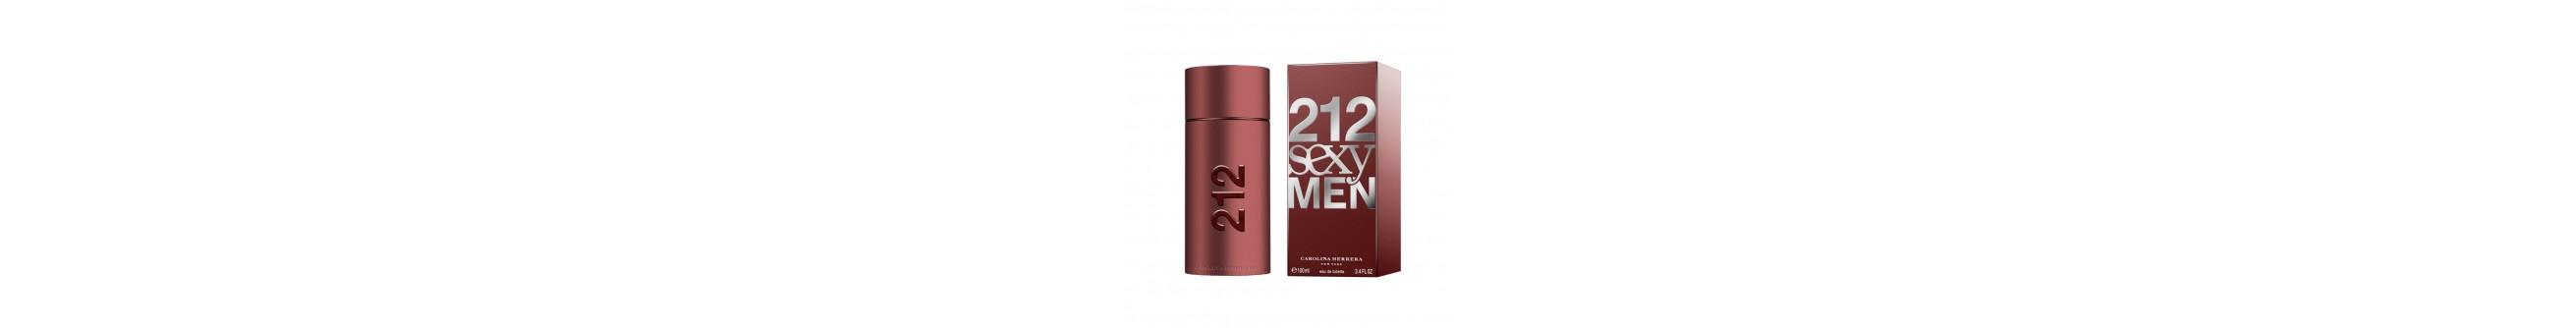 212 Sexy Men - Carolina Herrera (άρωμα τύπου)